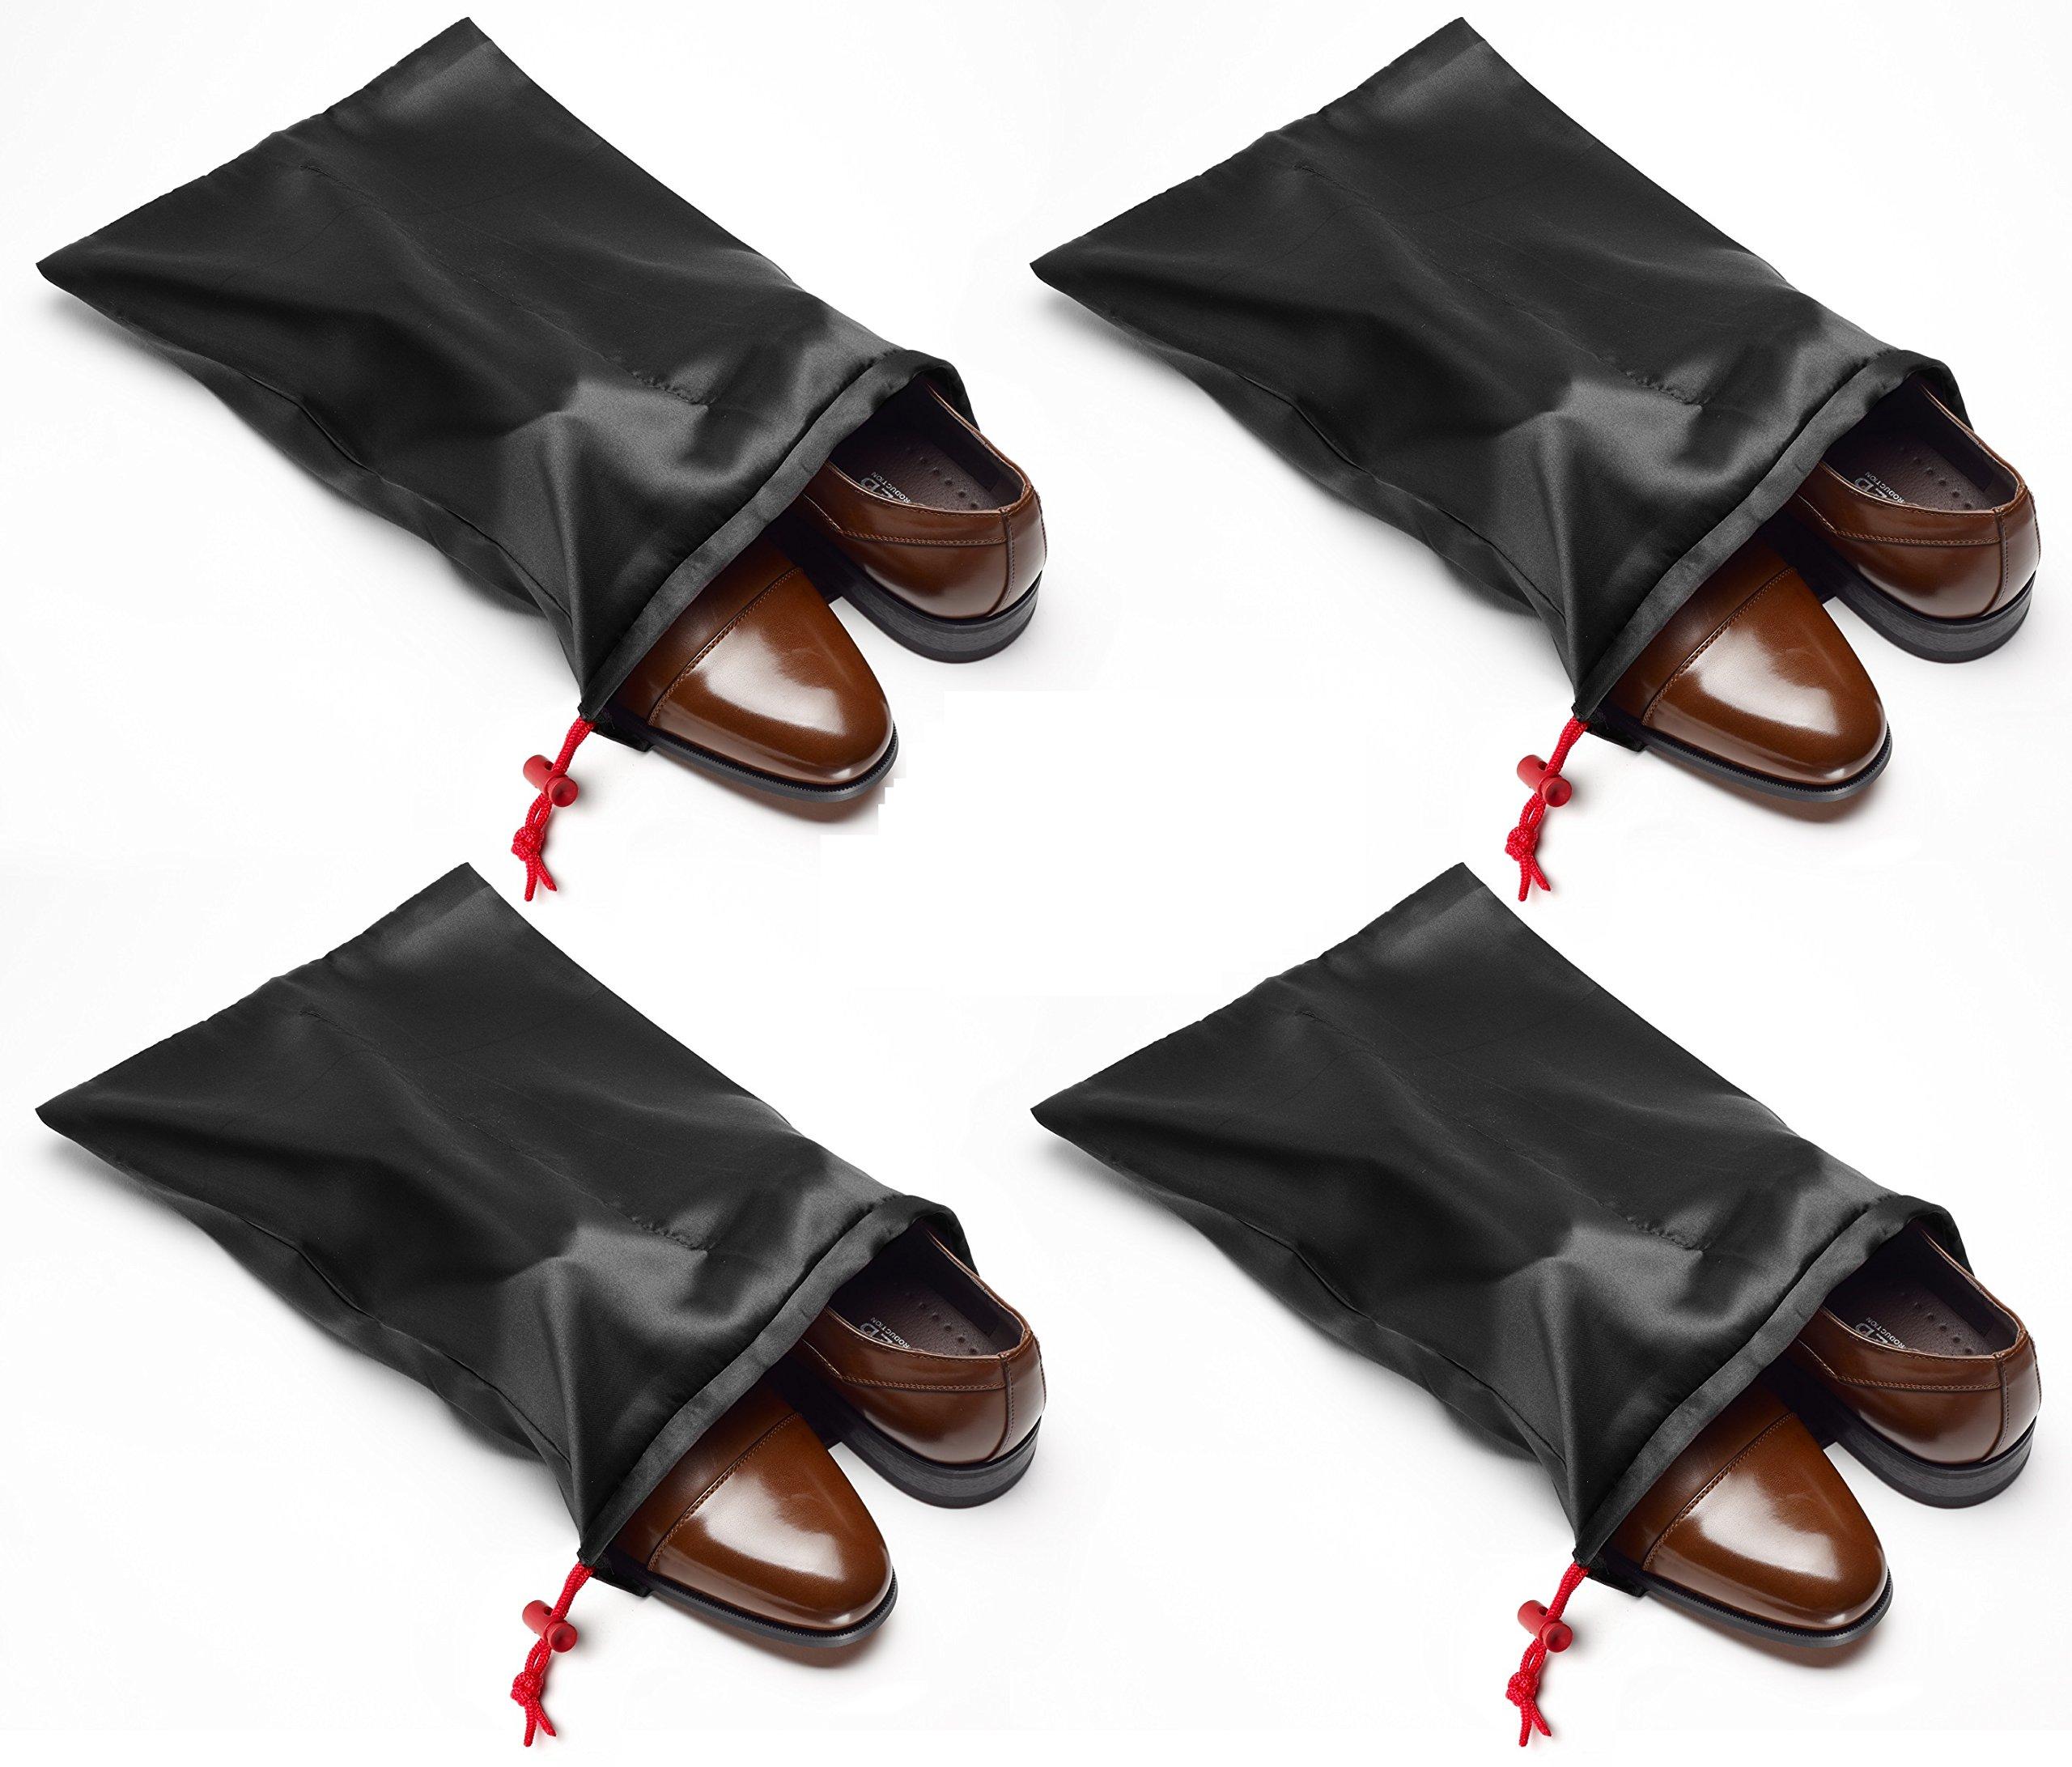 Tuff Guy Travel Shoe Bags 18''x 14'' w/Locking Drawstring and Center Divider. (Black) -Set of 4 Soft Nylon Shoe Bag. Woman and Men